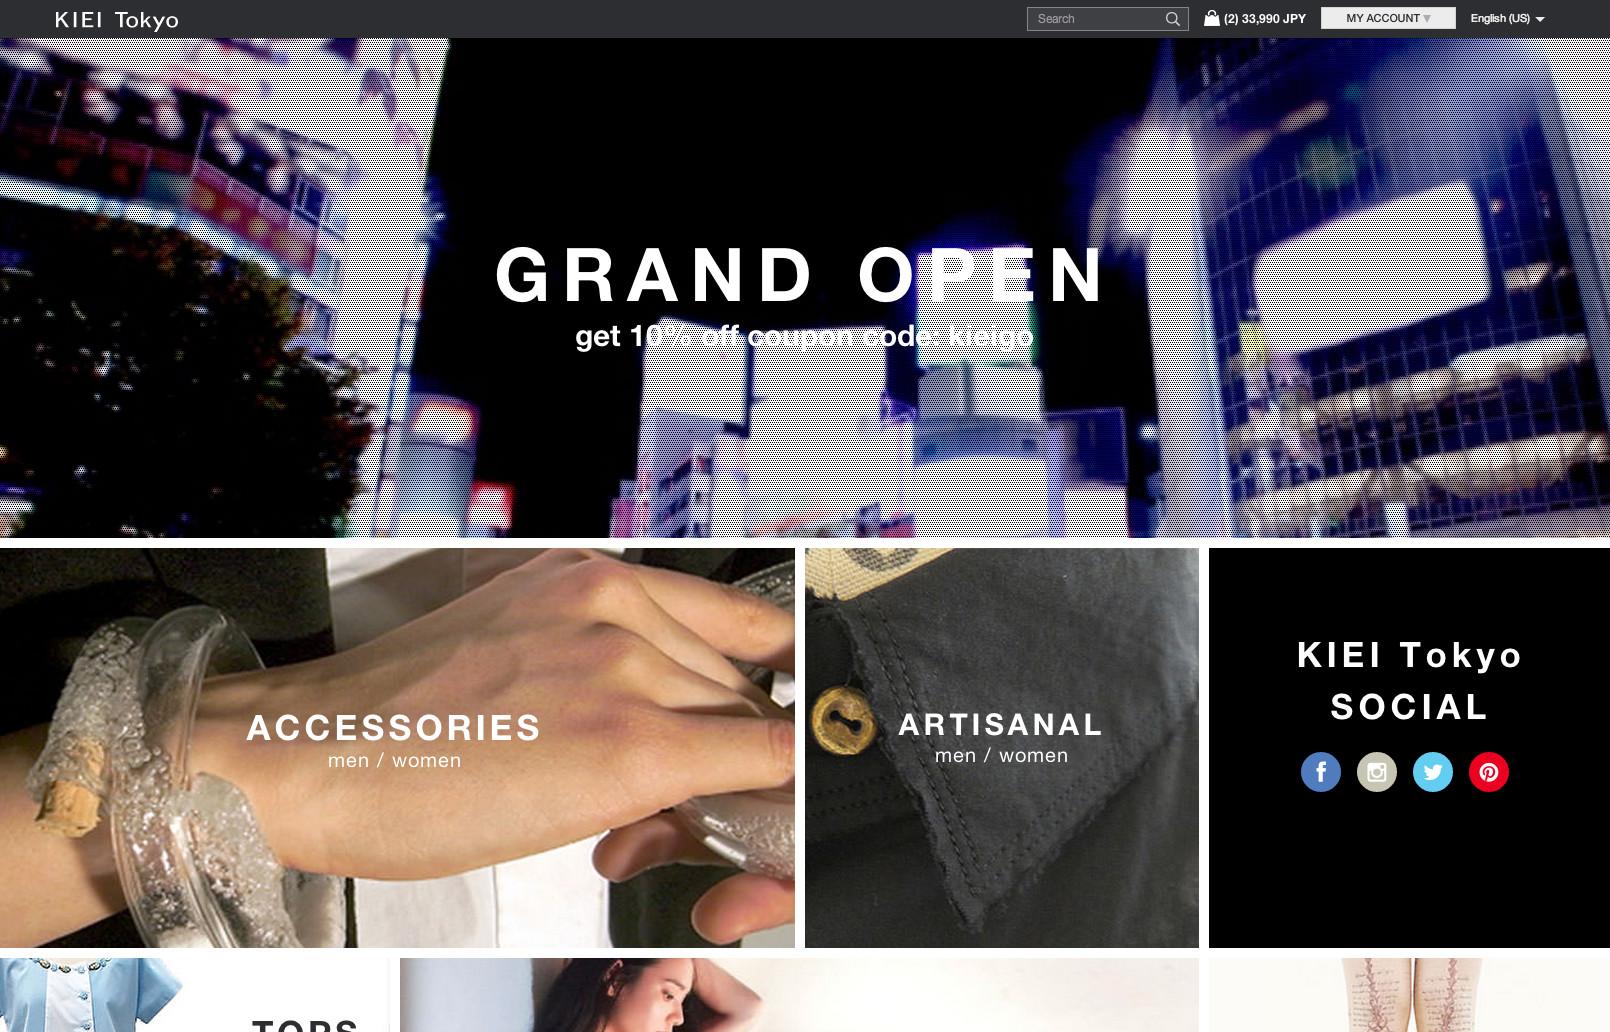 grand_open_002